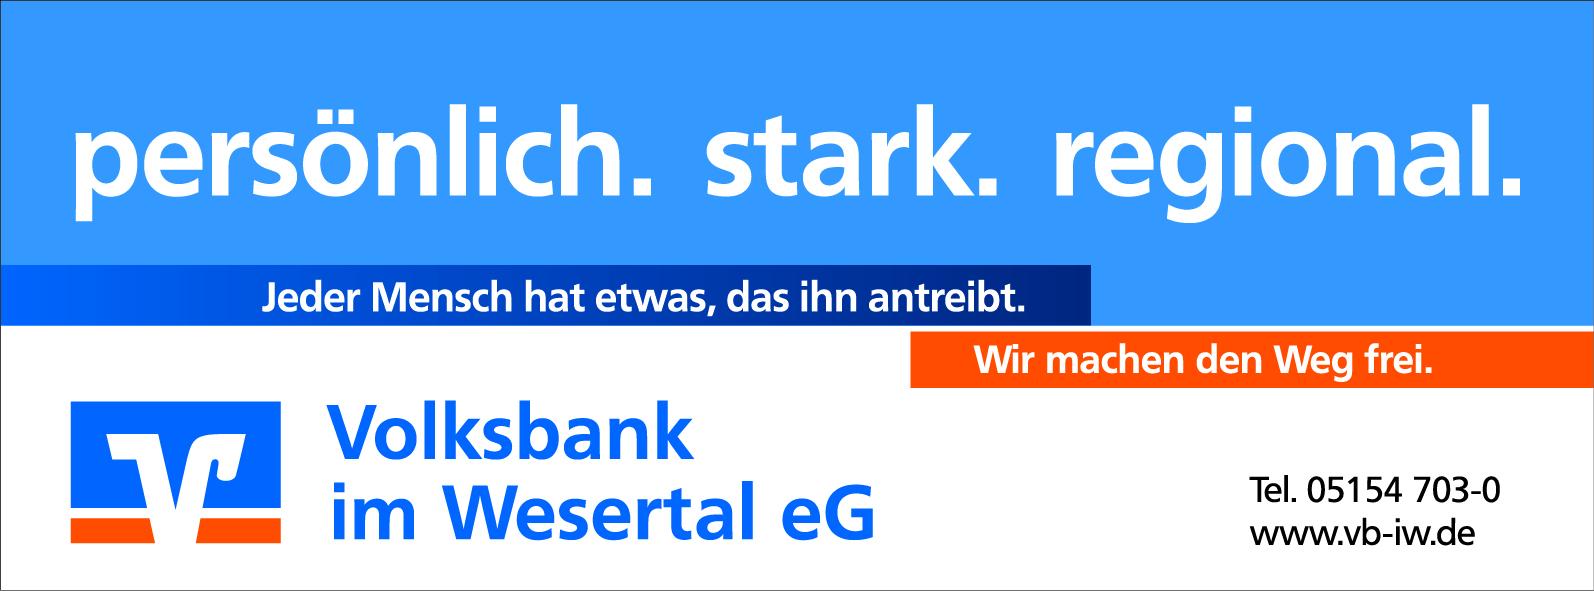 Volksbank im Wesertal eG